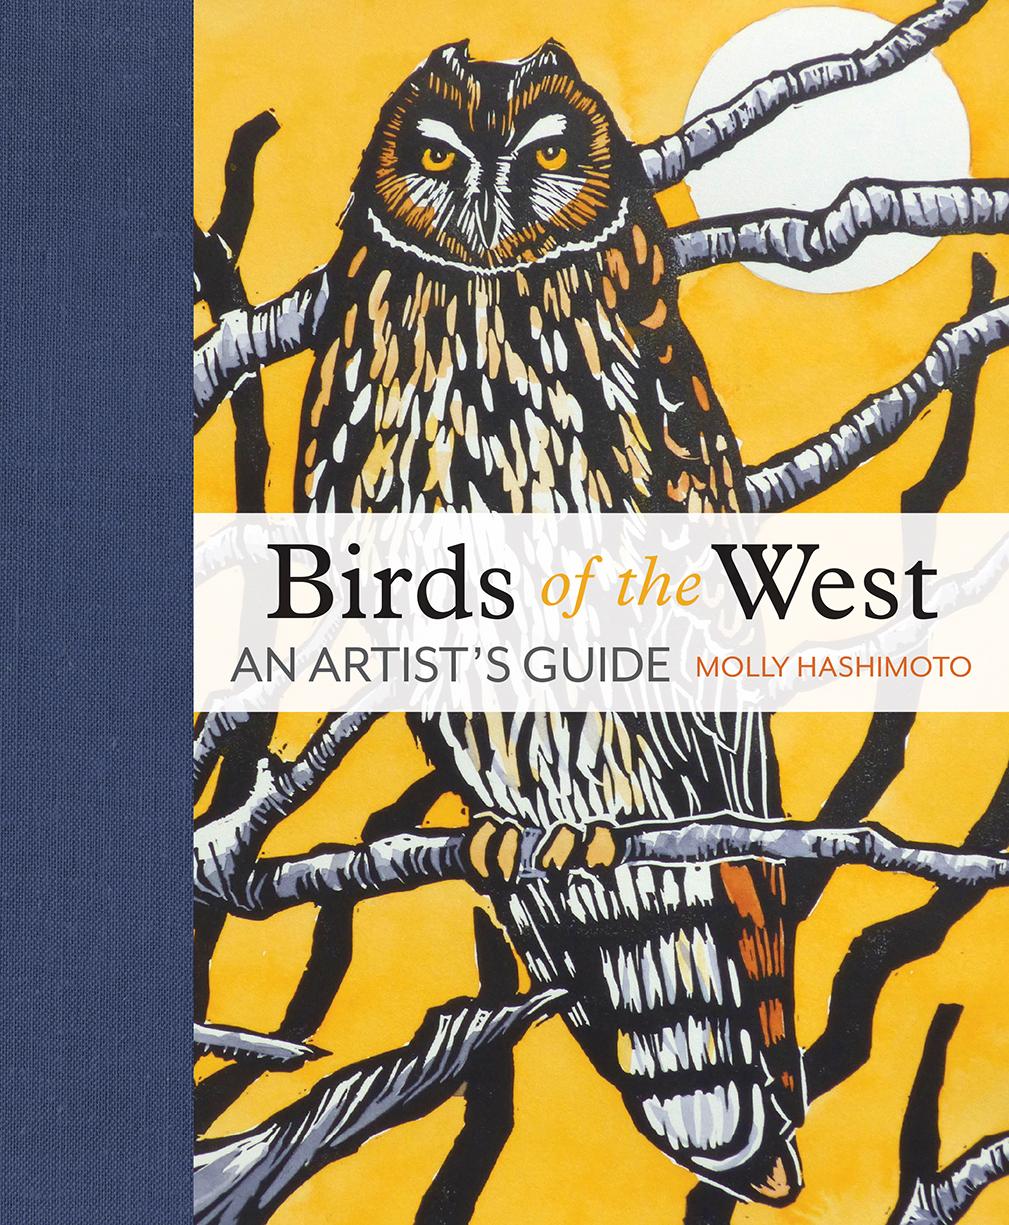 BirdsOfTheWest_Cover_Final_WebS.jpg